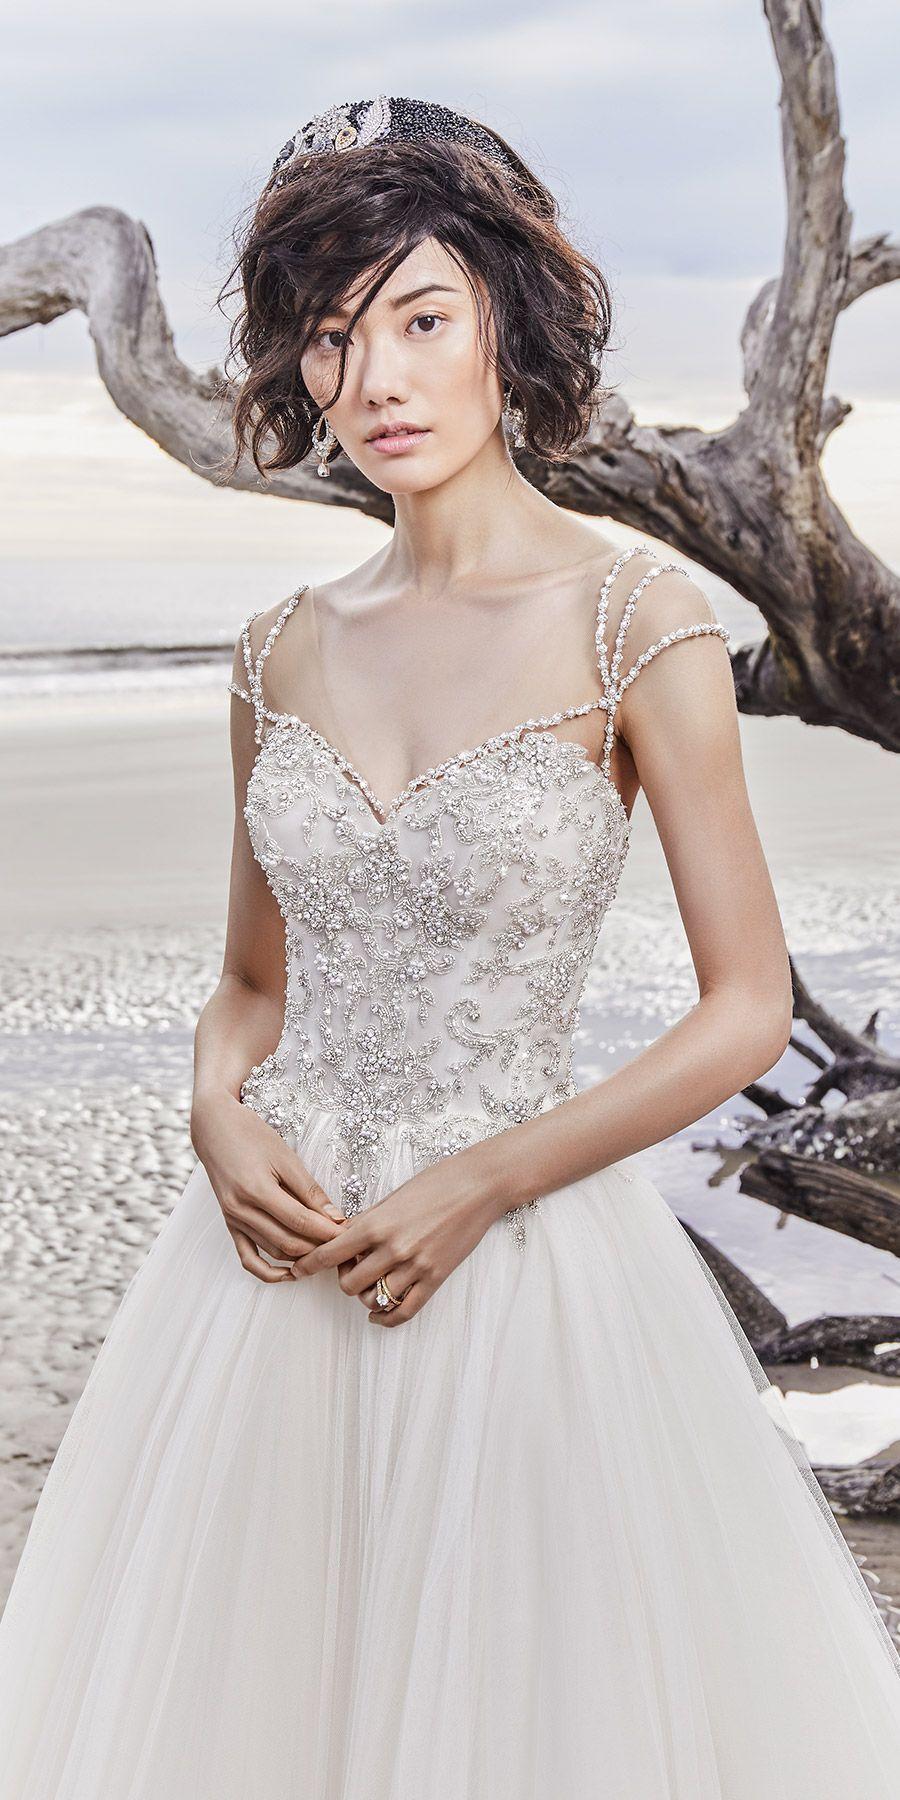 Wedding Dresses Bridal Gowns Wedding Dresses Wedding Dresses Romantic Ball Gowns Wedding [ 1800 x 900 Pixel ]